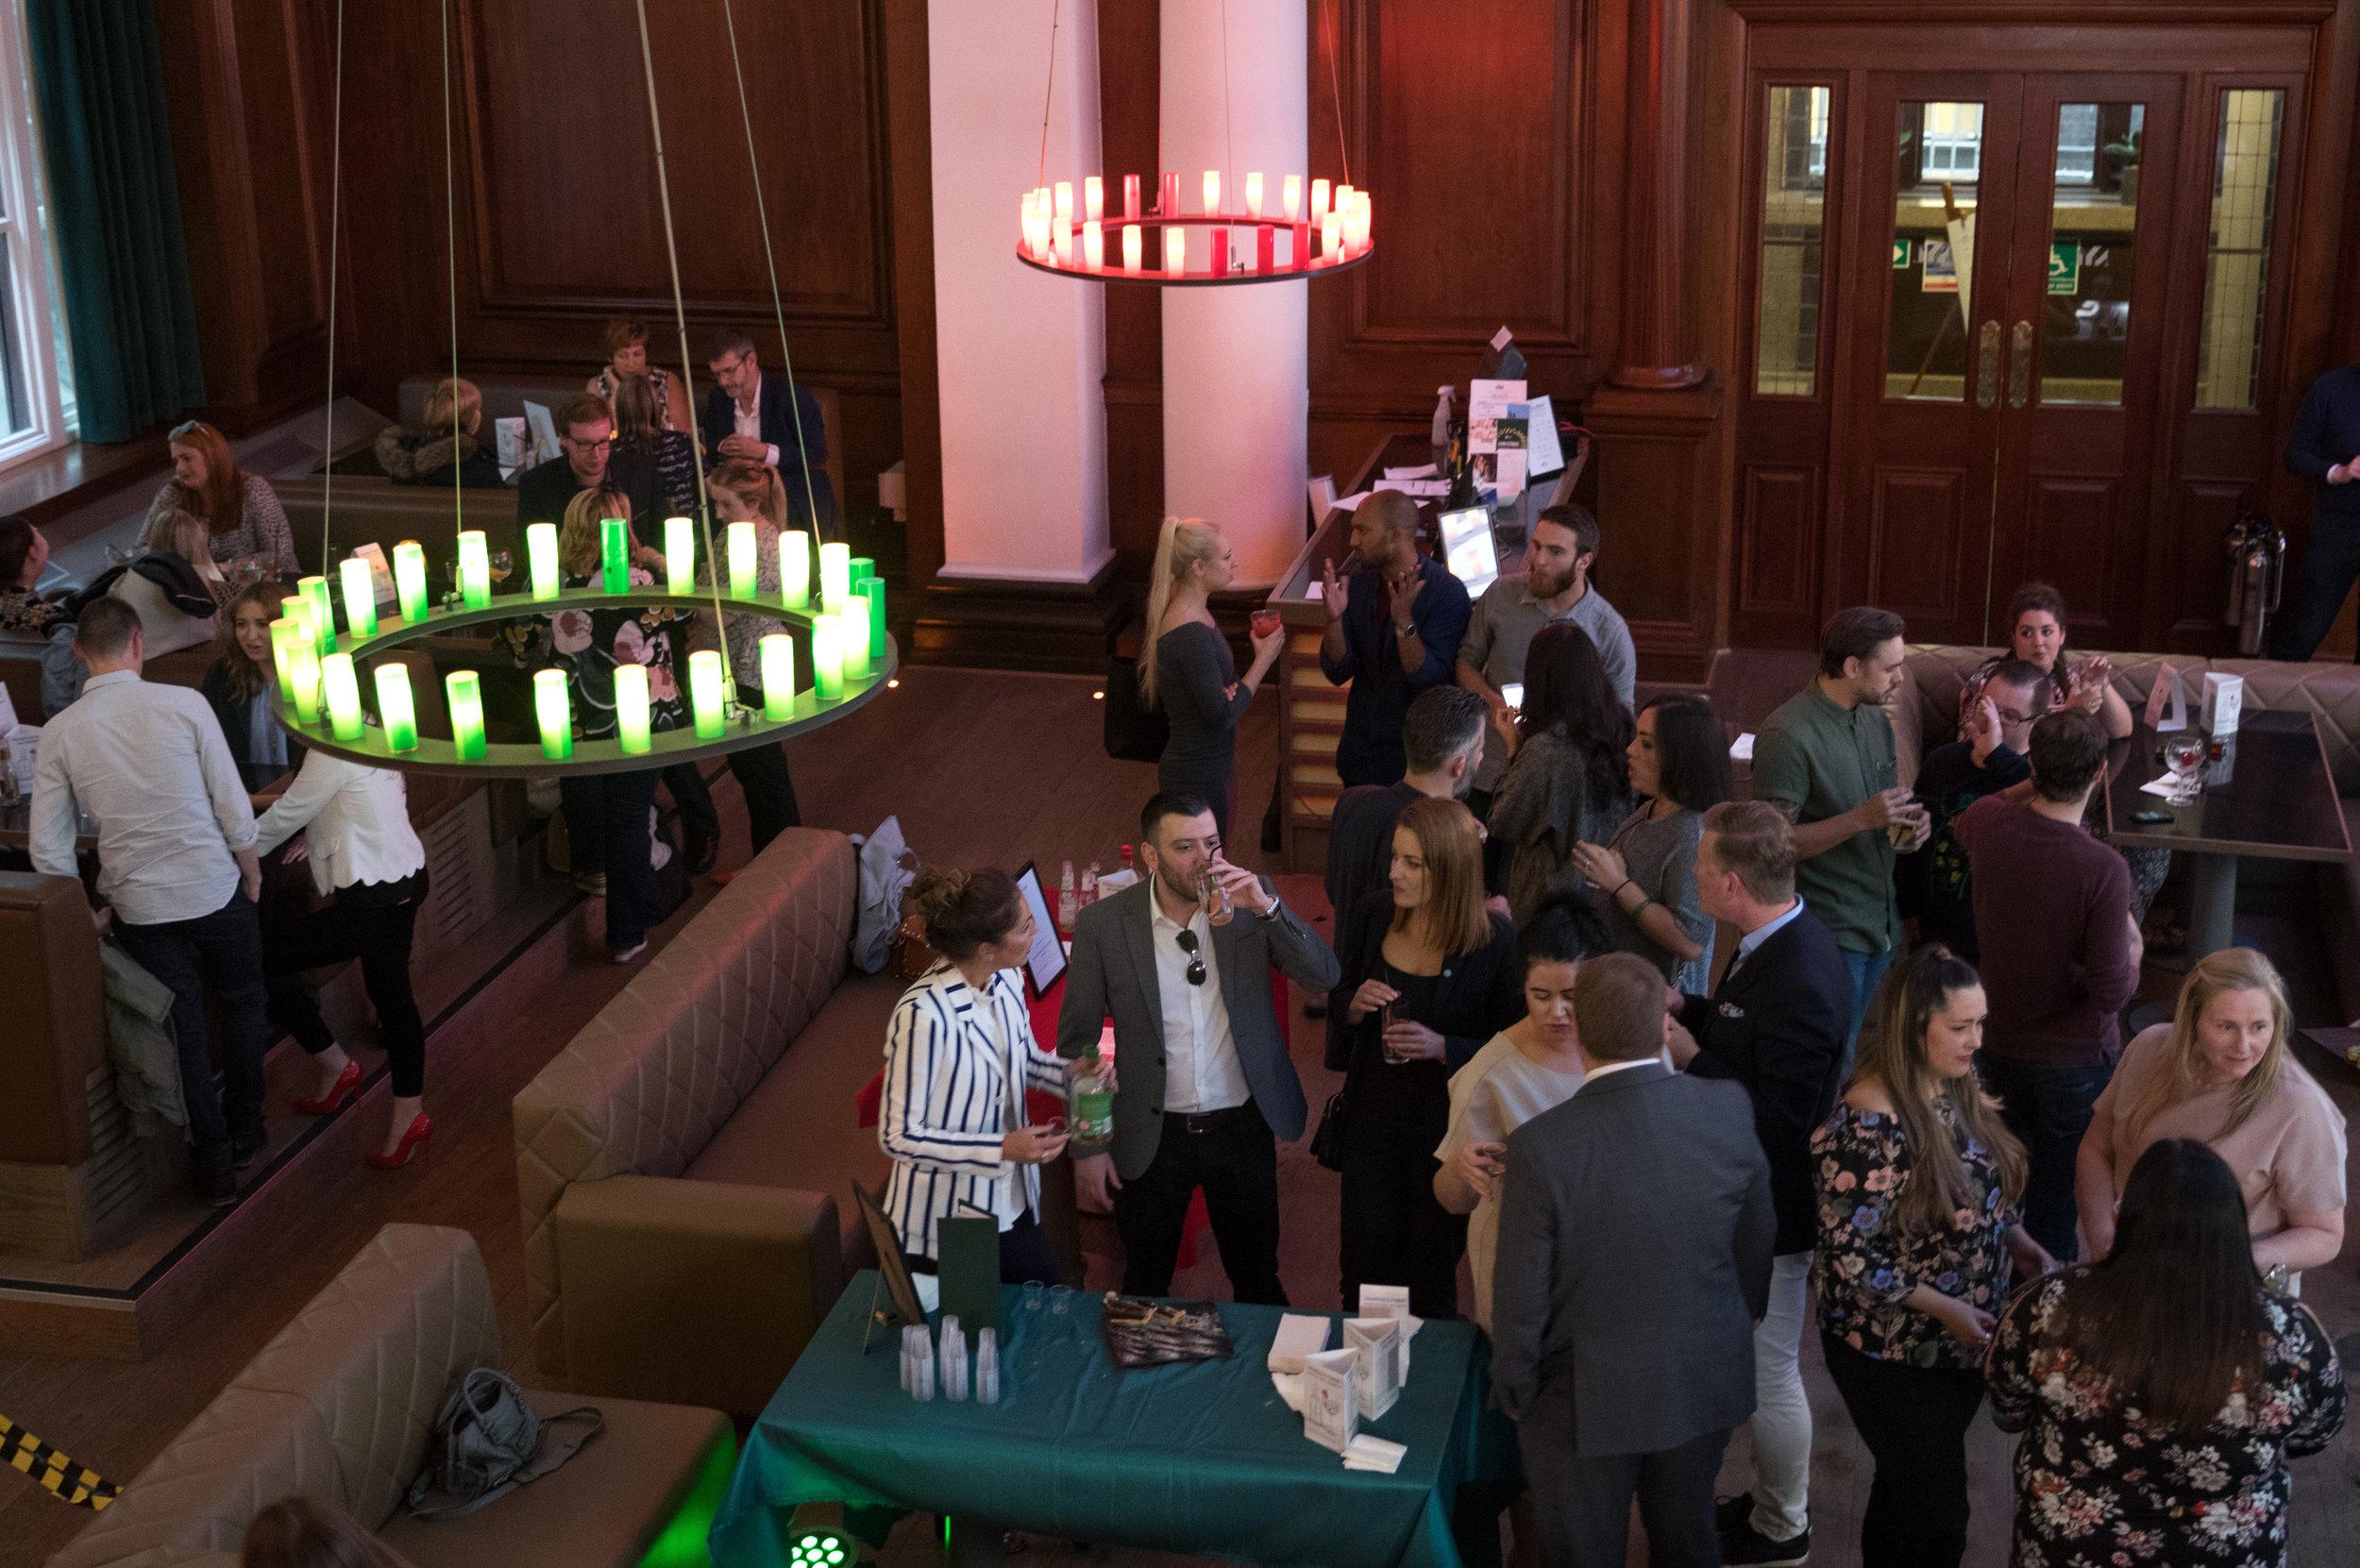 Aloft Hotel Event-100817-47.JPG